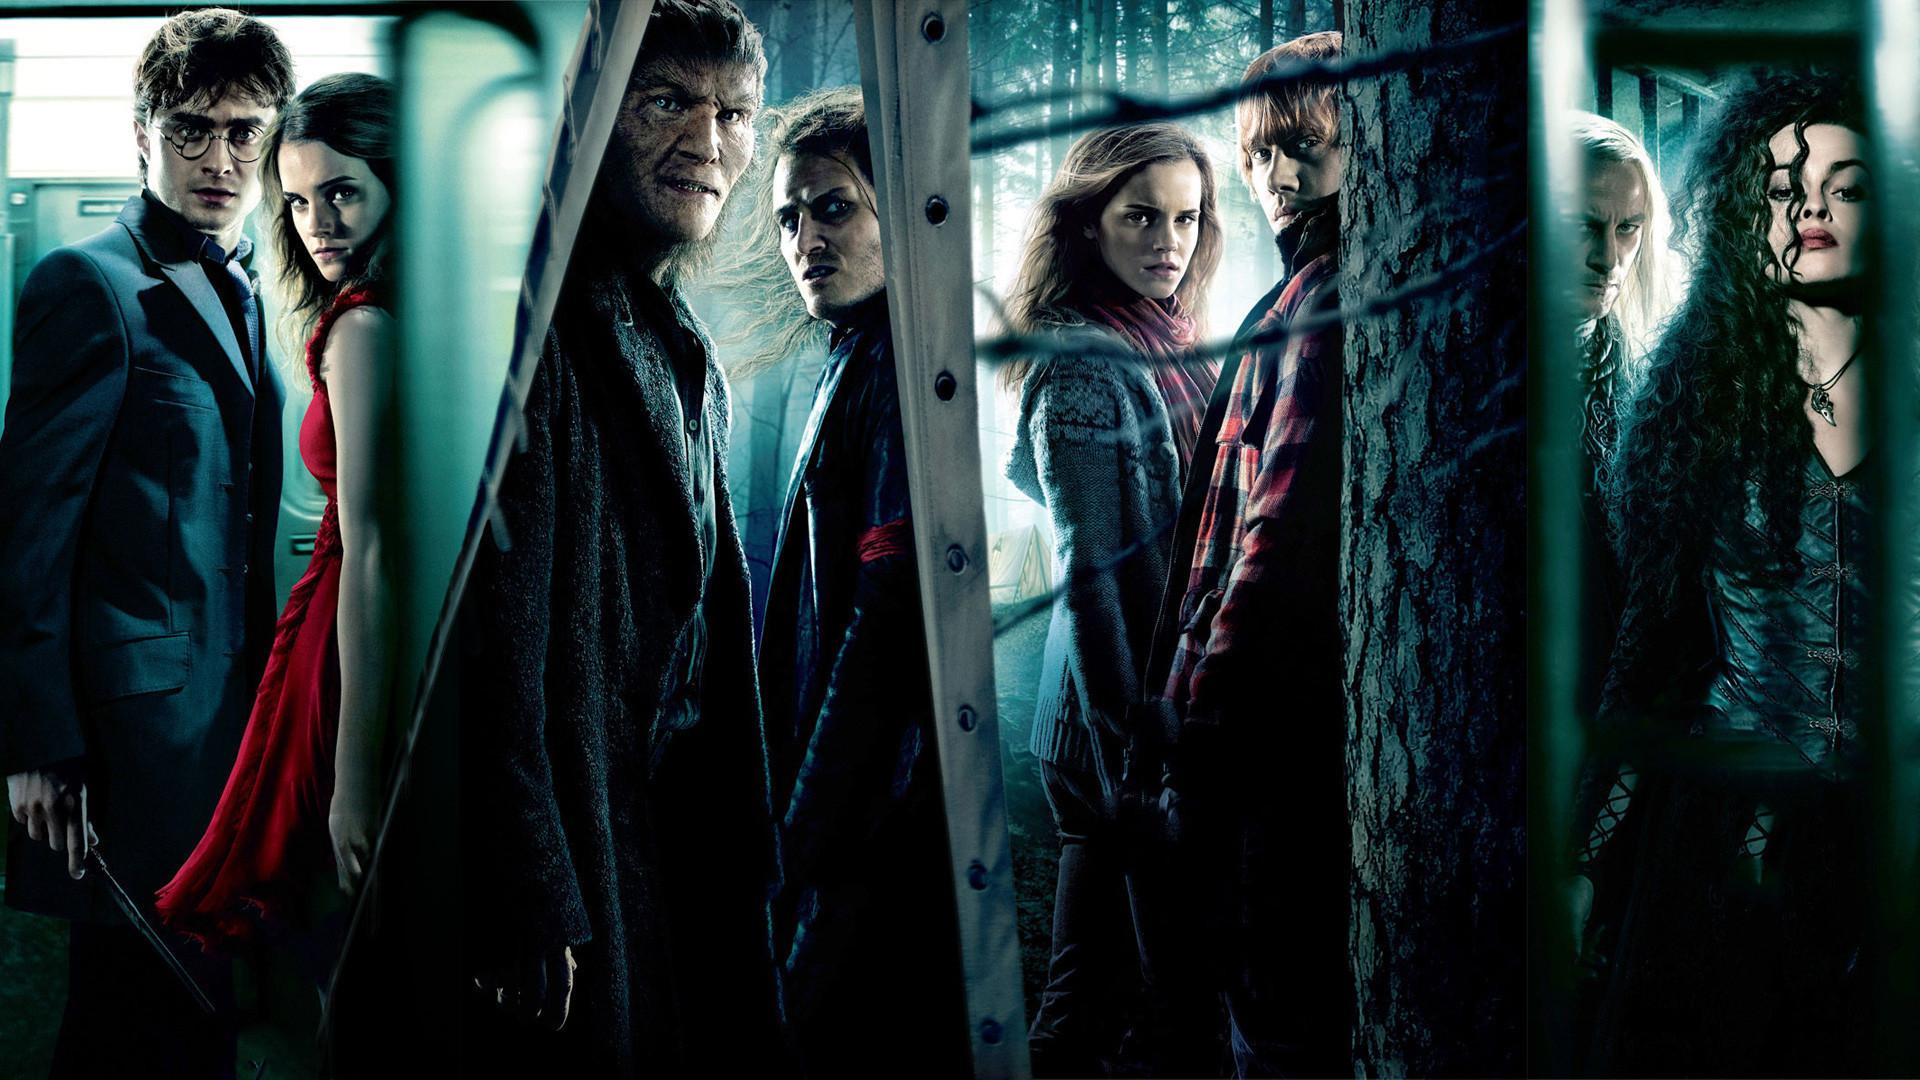 Harry Potter Hd Backgrounds | The World's #1 Harry Potter Wallpaper –  Coachoutletasb.com